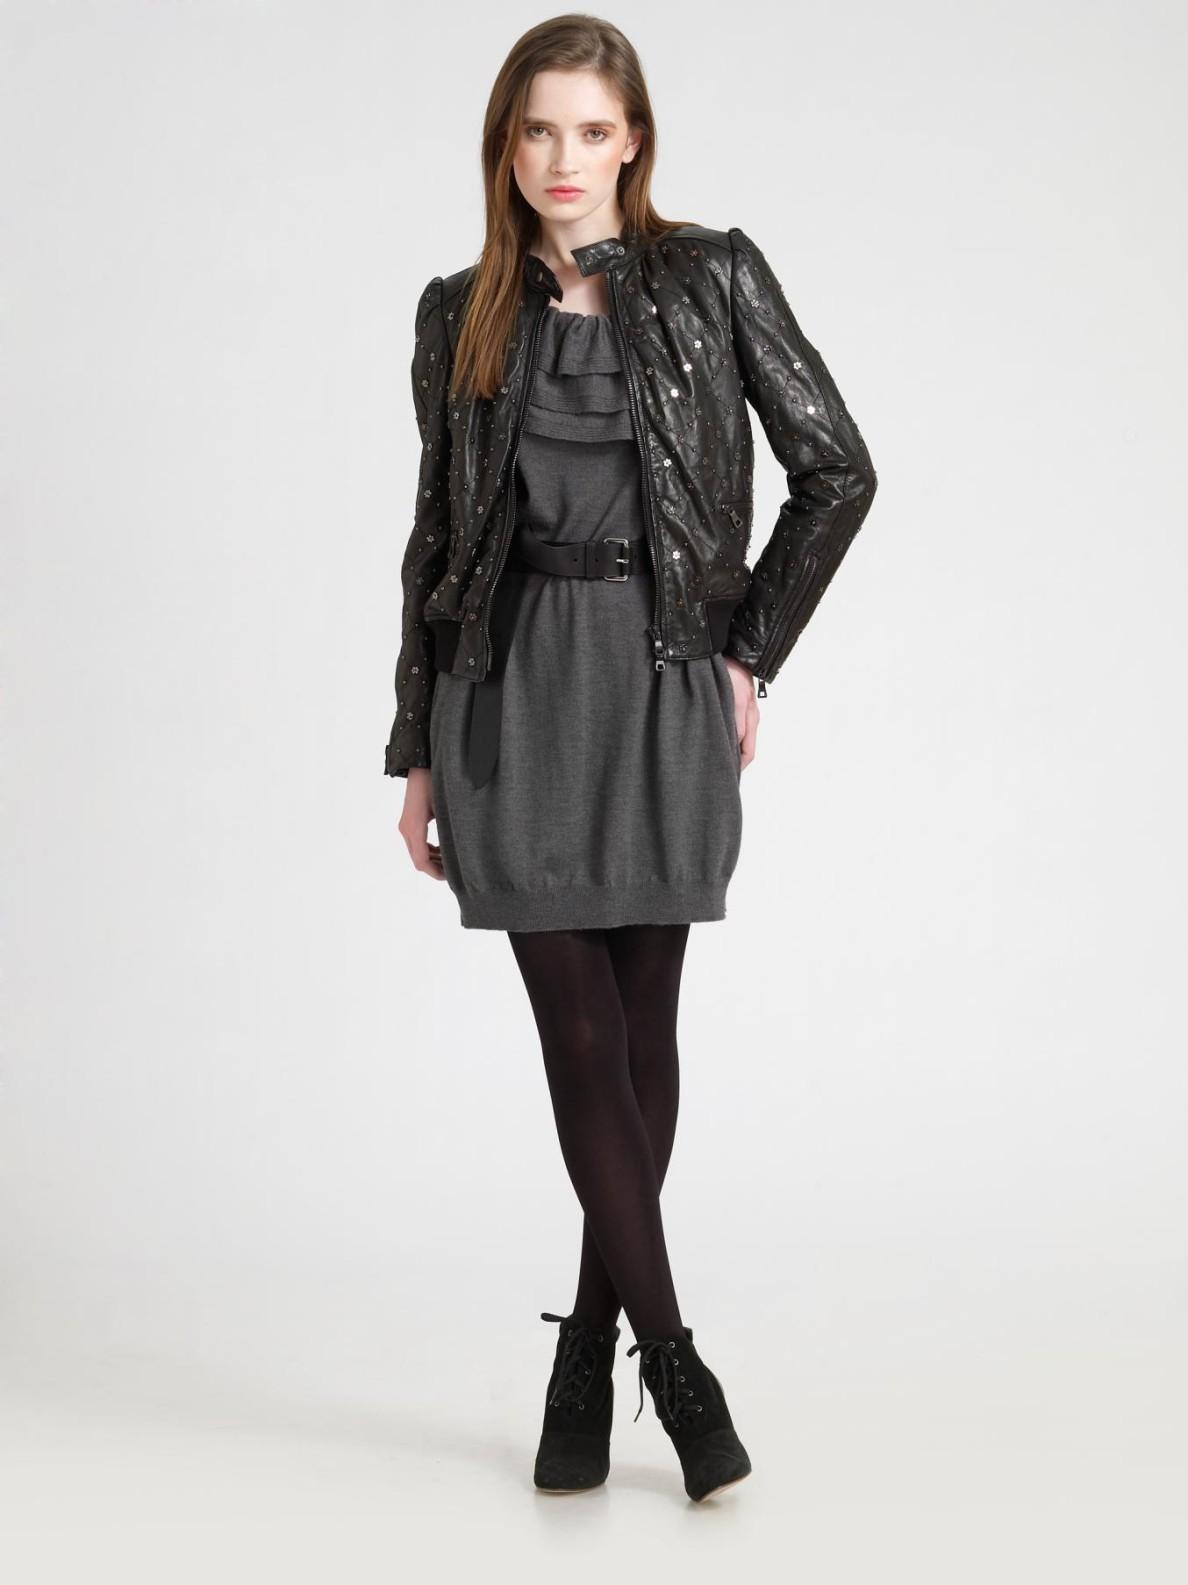 Black leather jacket cheap